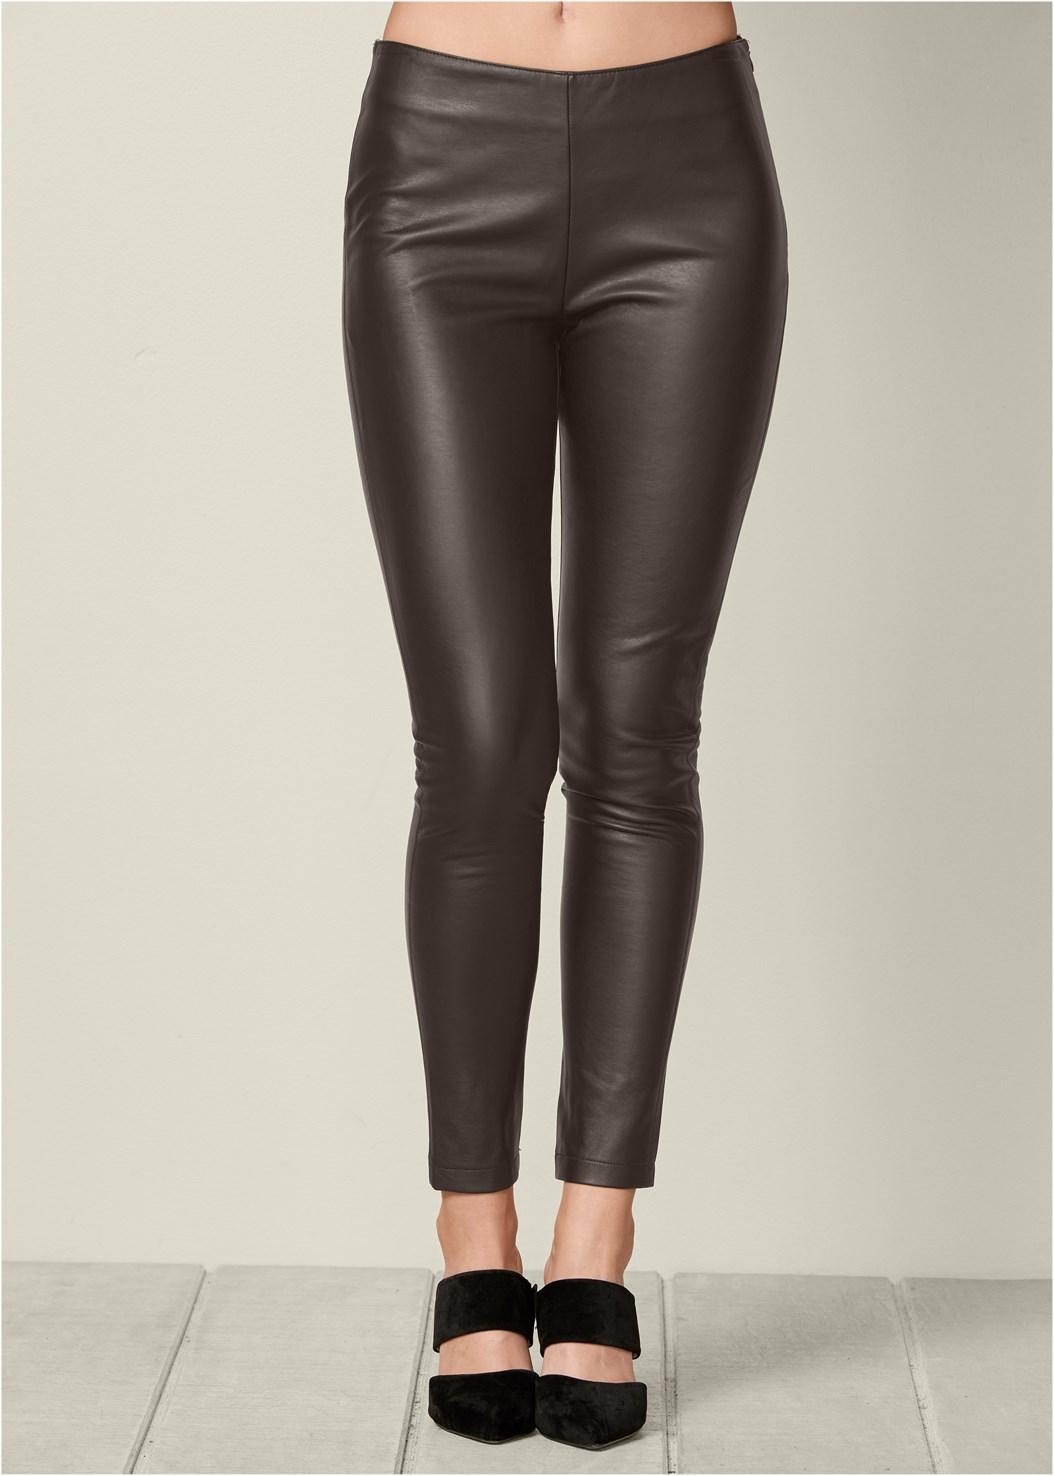 Faux Leather Leggings,Tie Back Boots